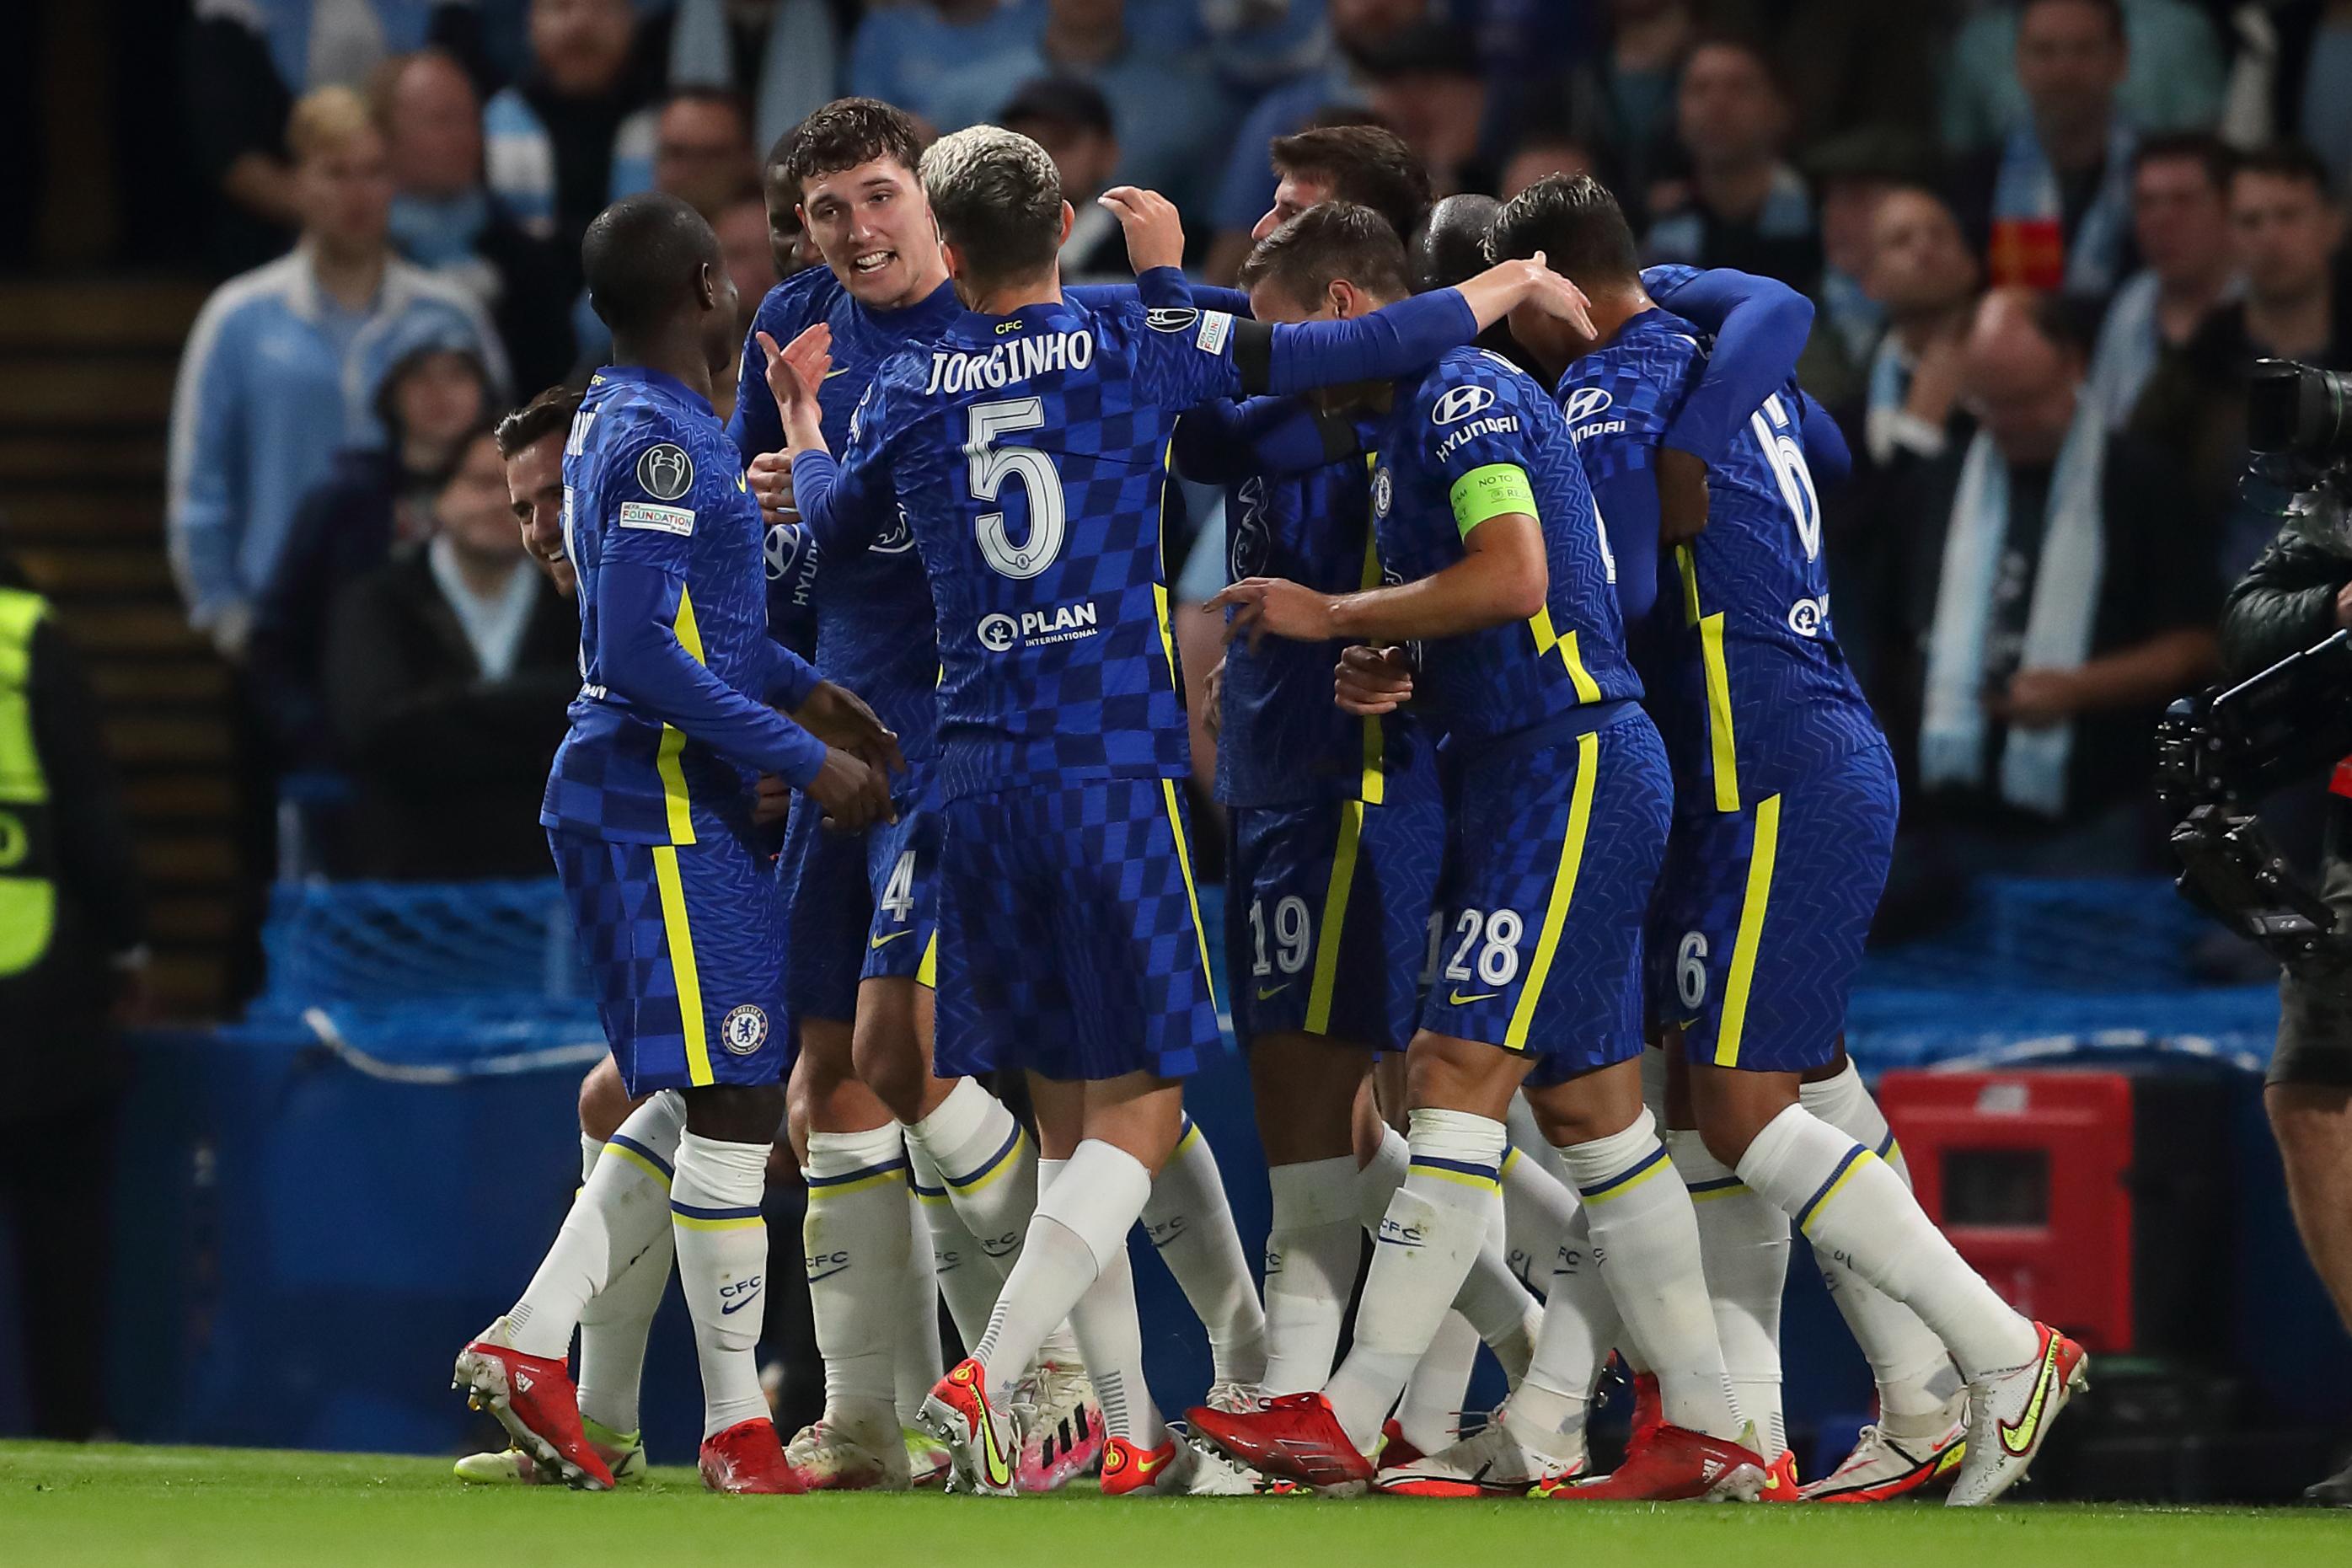 Chelsea FC v Malmo FF: Group H - UEFA Champions League